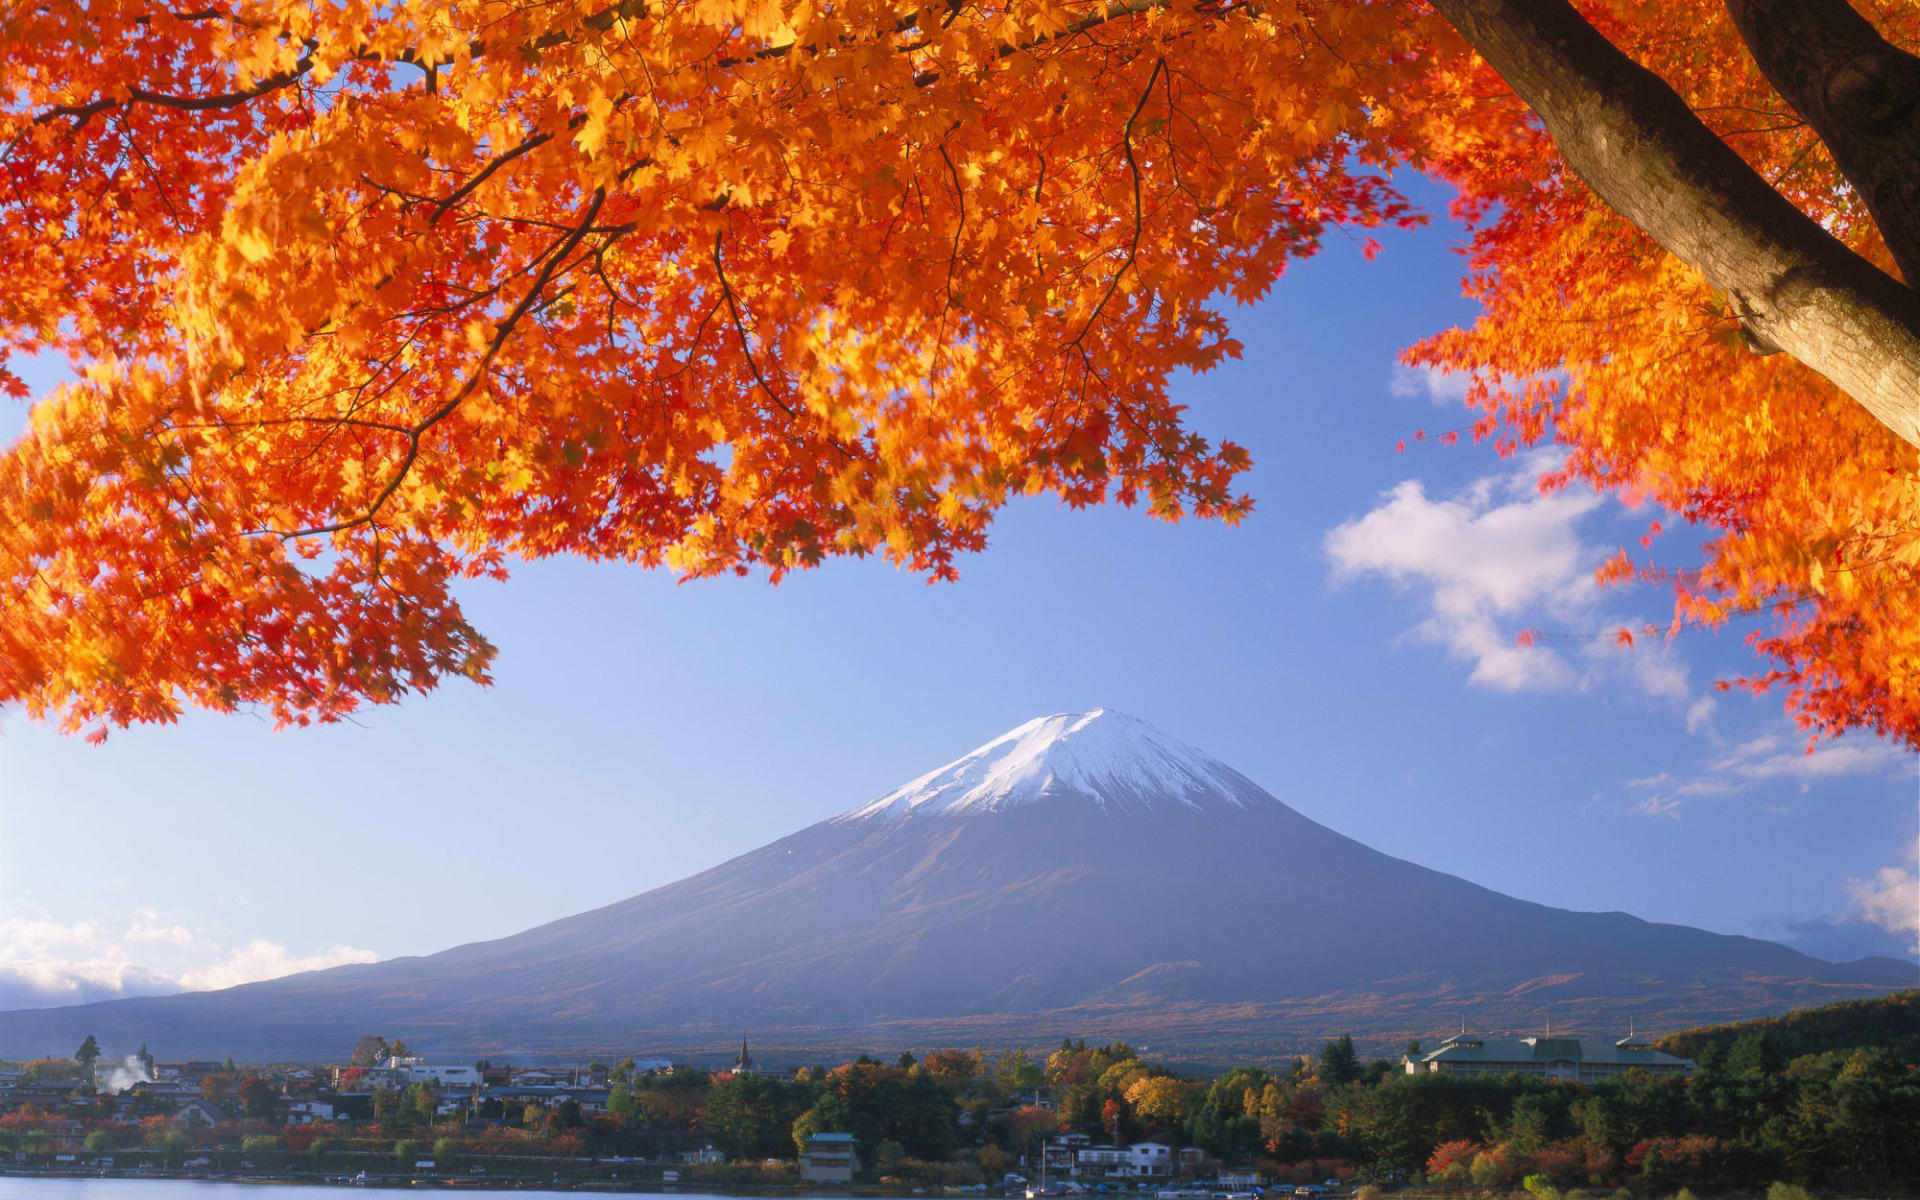 Mt. Fuji Trekking (Nebensaison) ab Tokio: Mt. Fuji: autumn colours